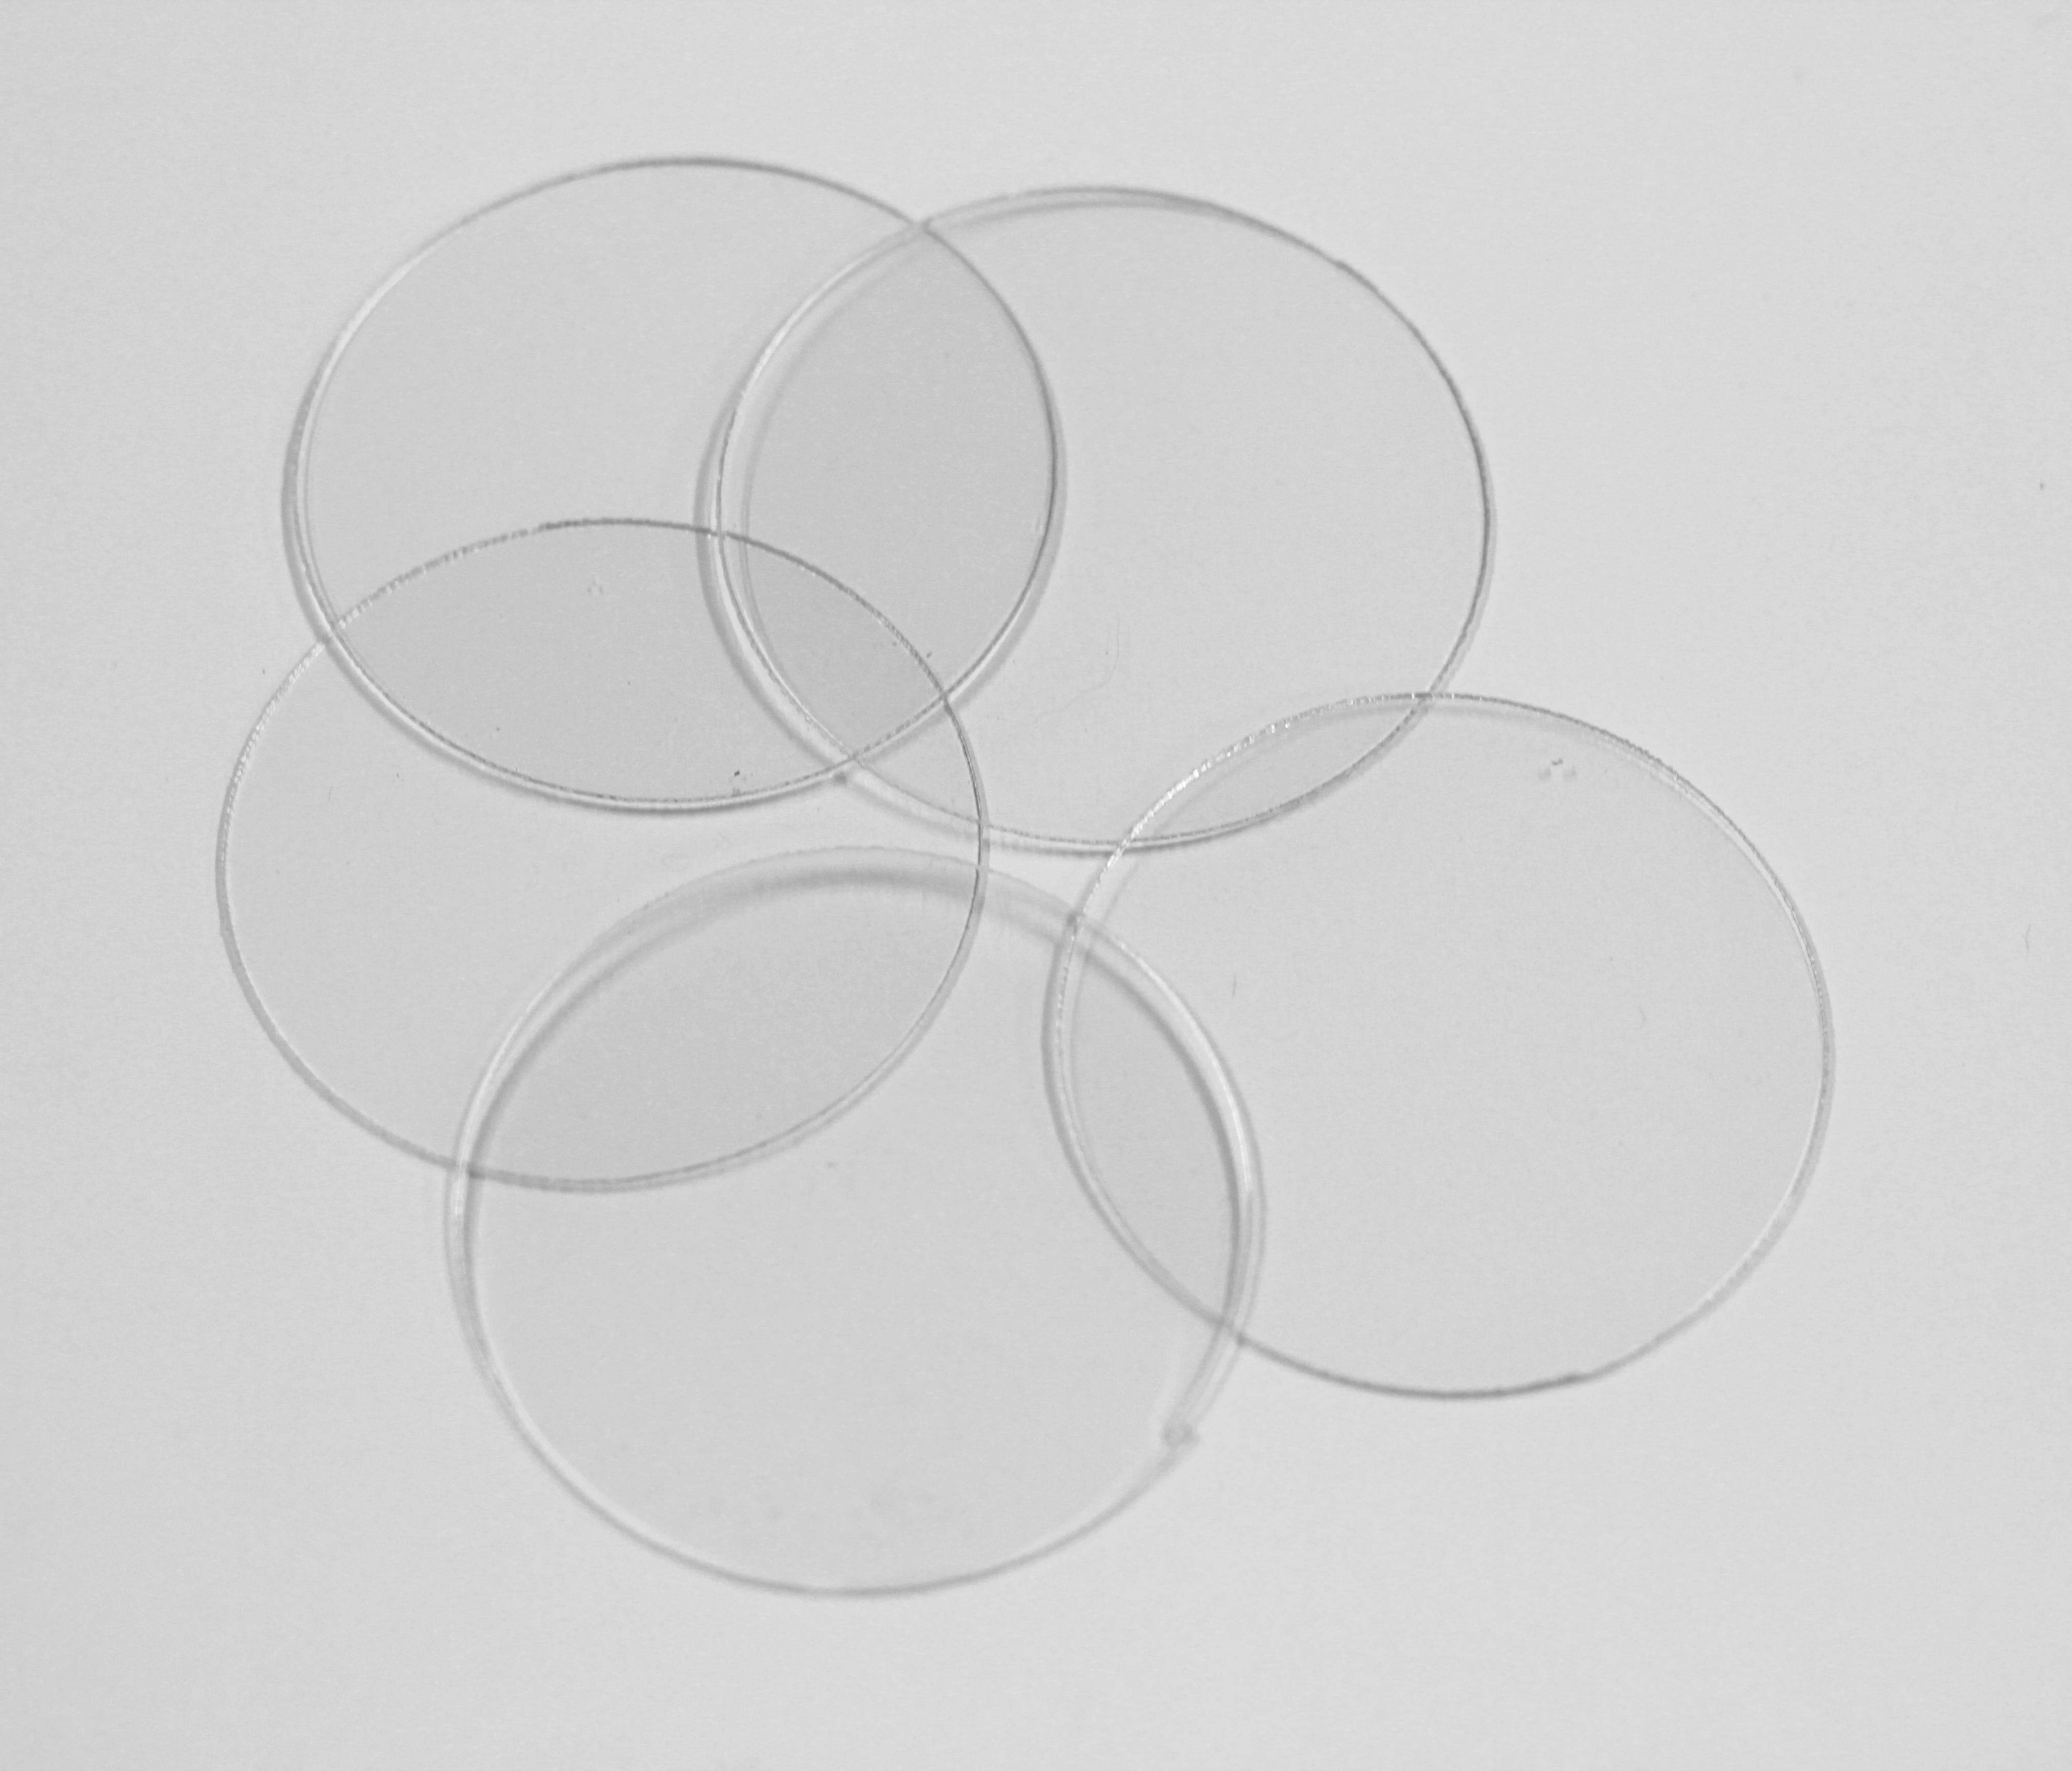 laser cut final circles